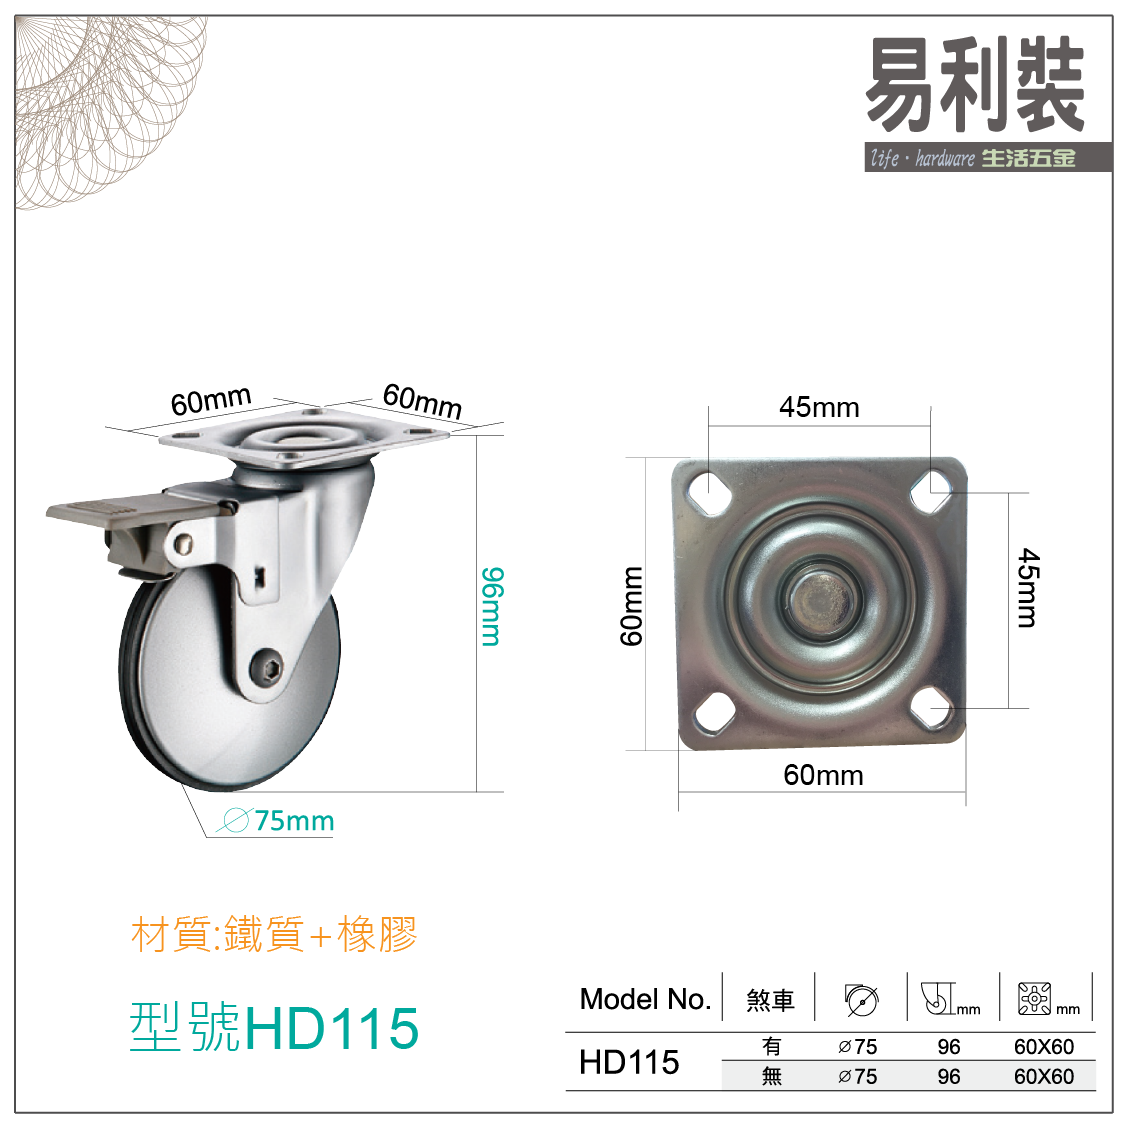 【 EASYCAN  】HD114-115活動輪 易利裝生活五金 桌輪 櫃輪 房間 臥房 衣櫃 小資族 辦公家具 系統家具 2